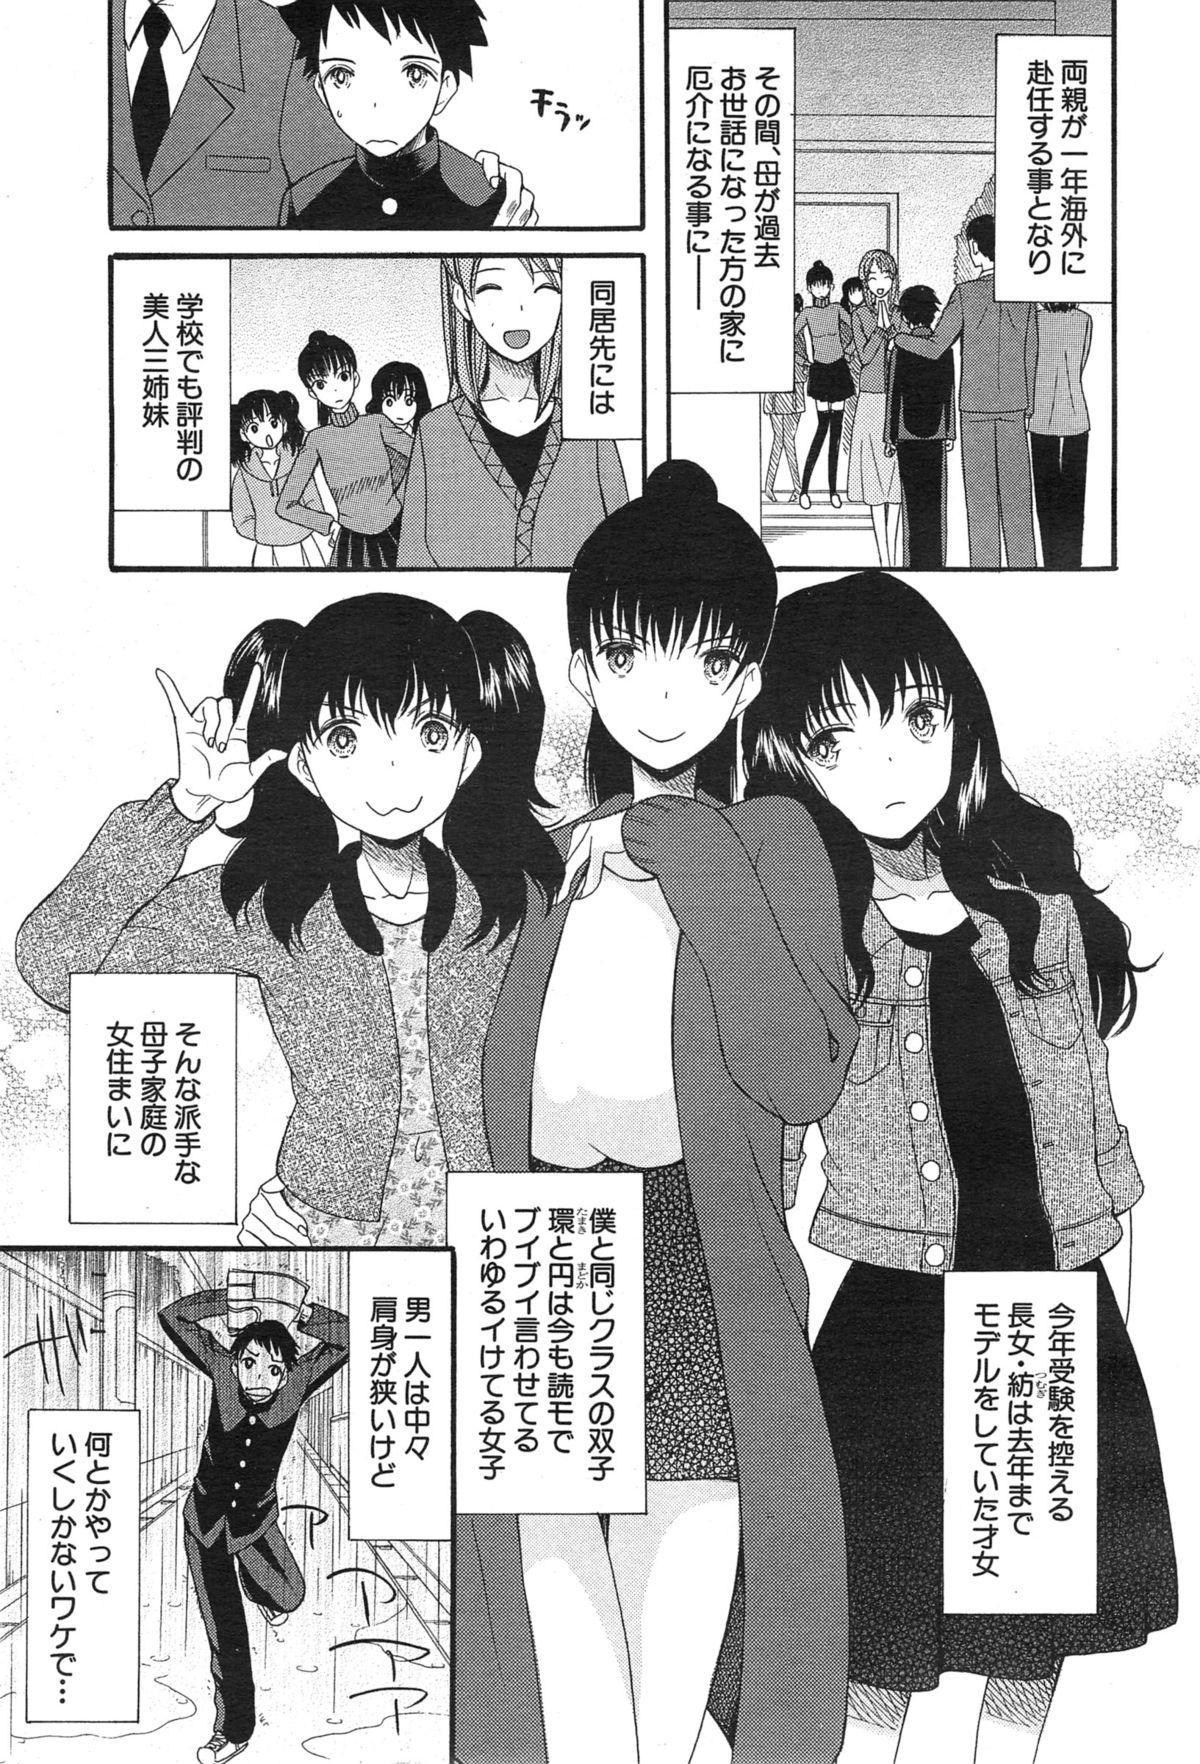 Kawaiku Natte Omocha ni Natte 2